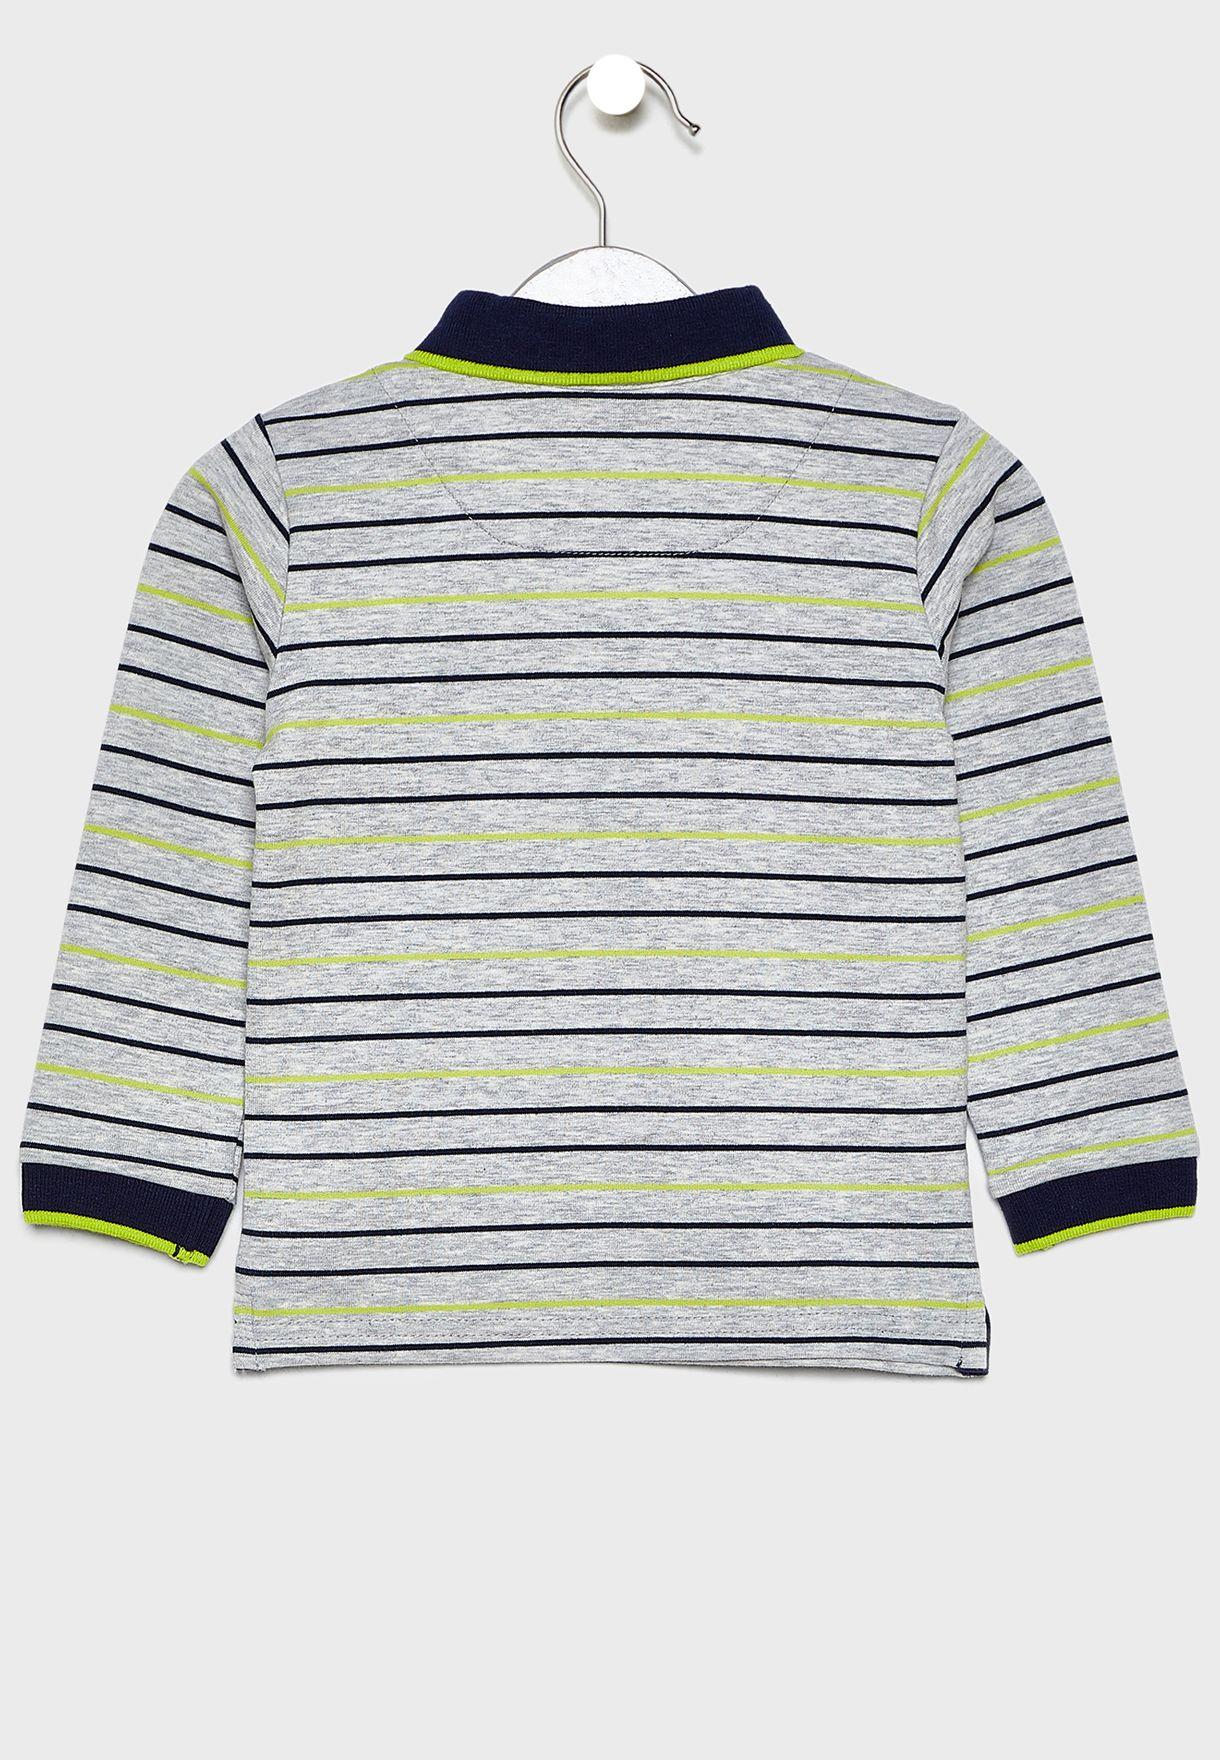 Kids Striped T-Shirt + Jogg Jeans Set